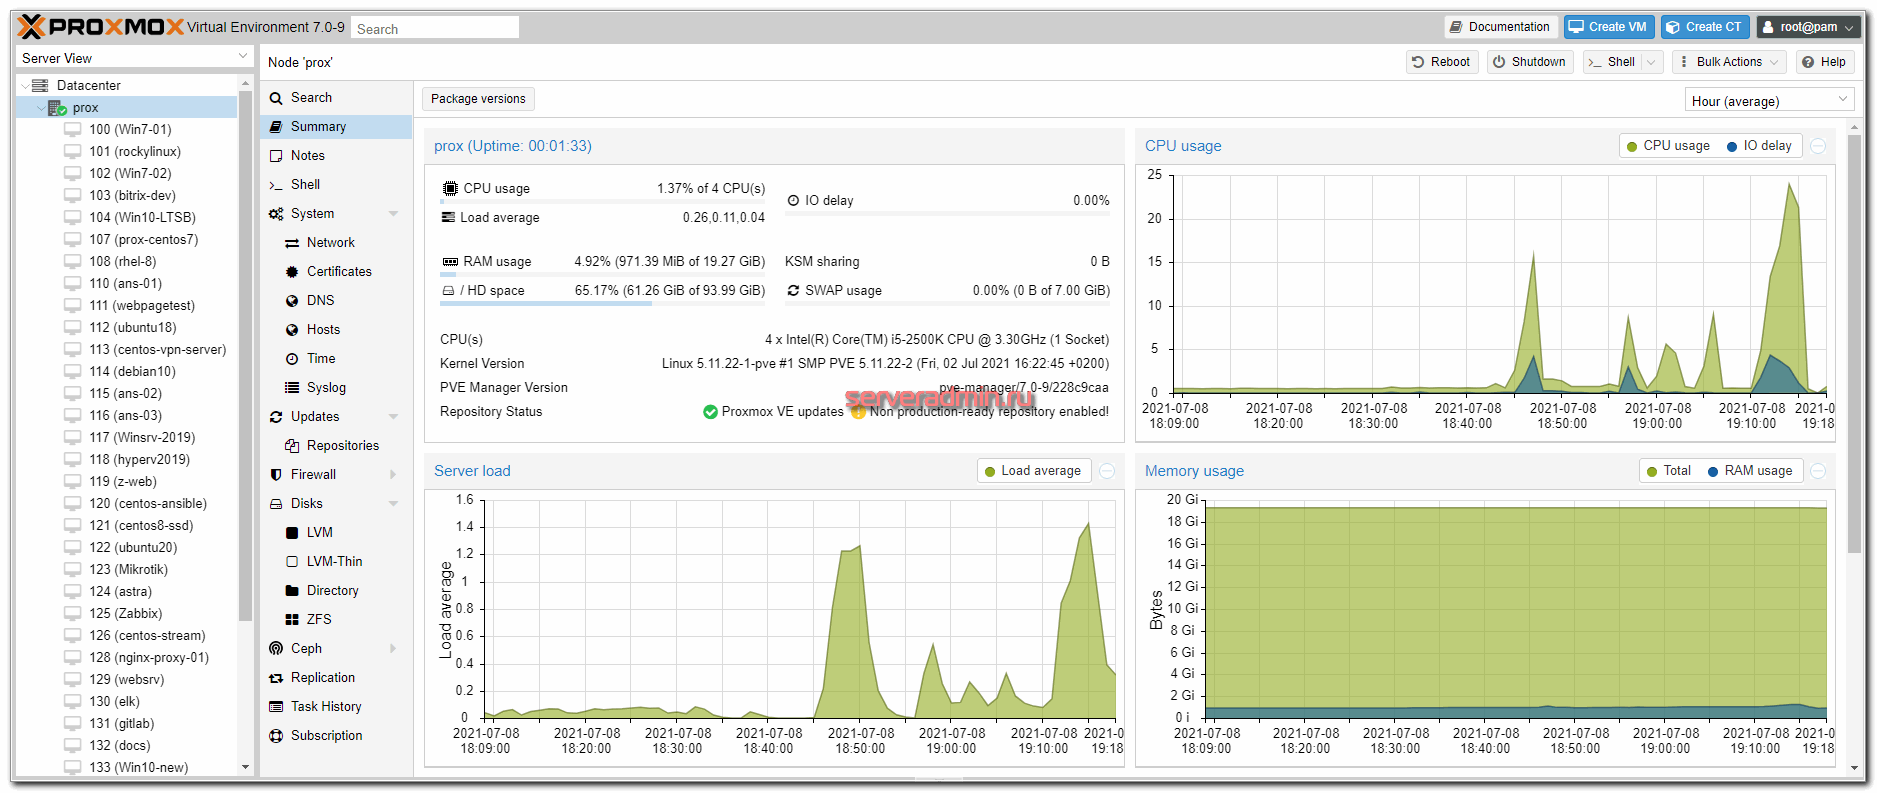 Web интерфейс Proxmox VE 7